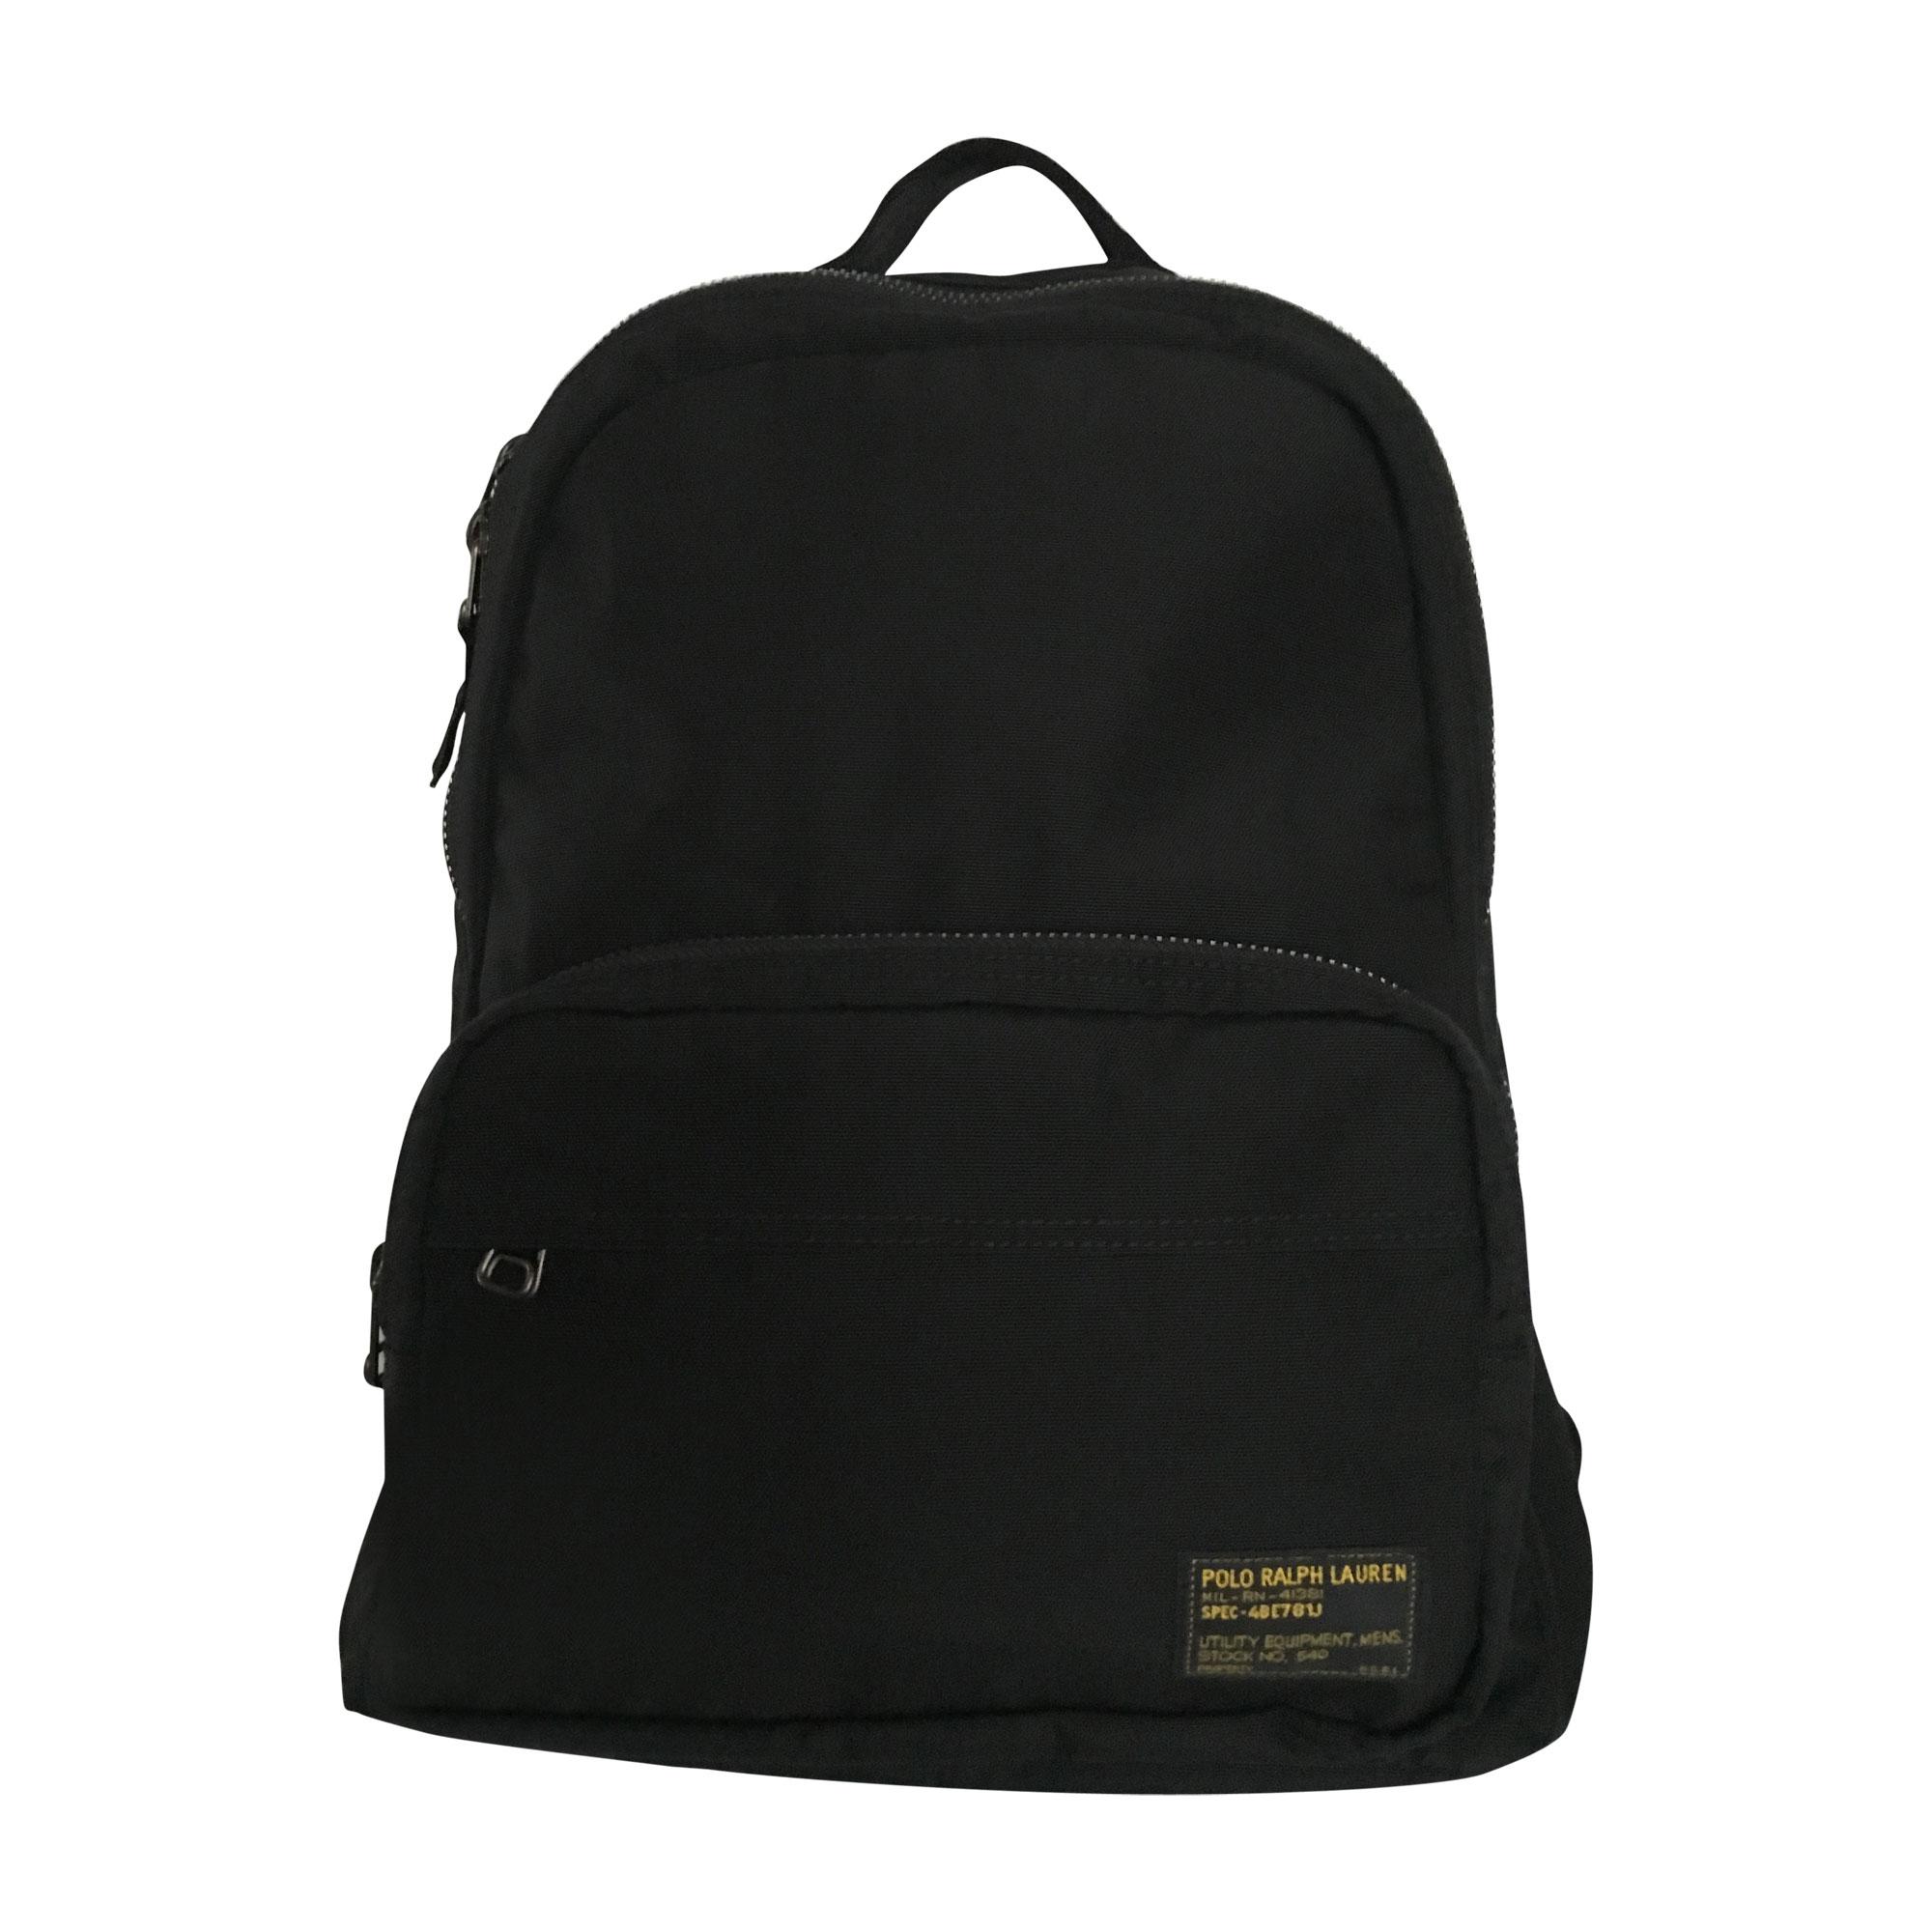 Polo Ralph Lauren Nylon Laptop Bag 2dd88b028a43a